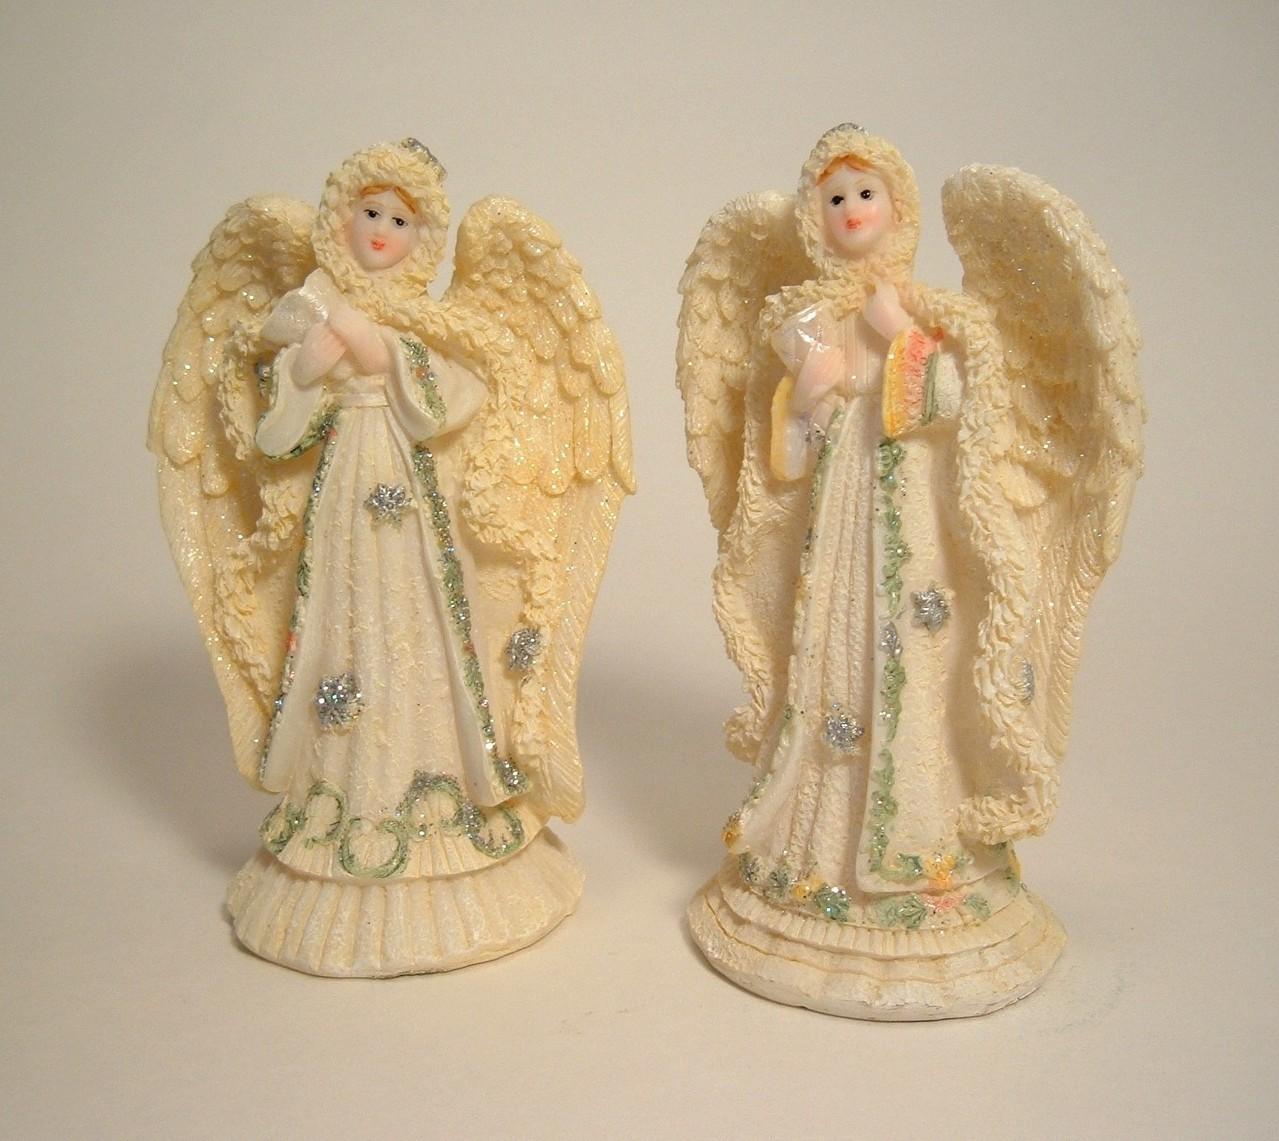 Kolekcjonowanie figurek